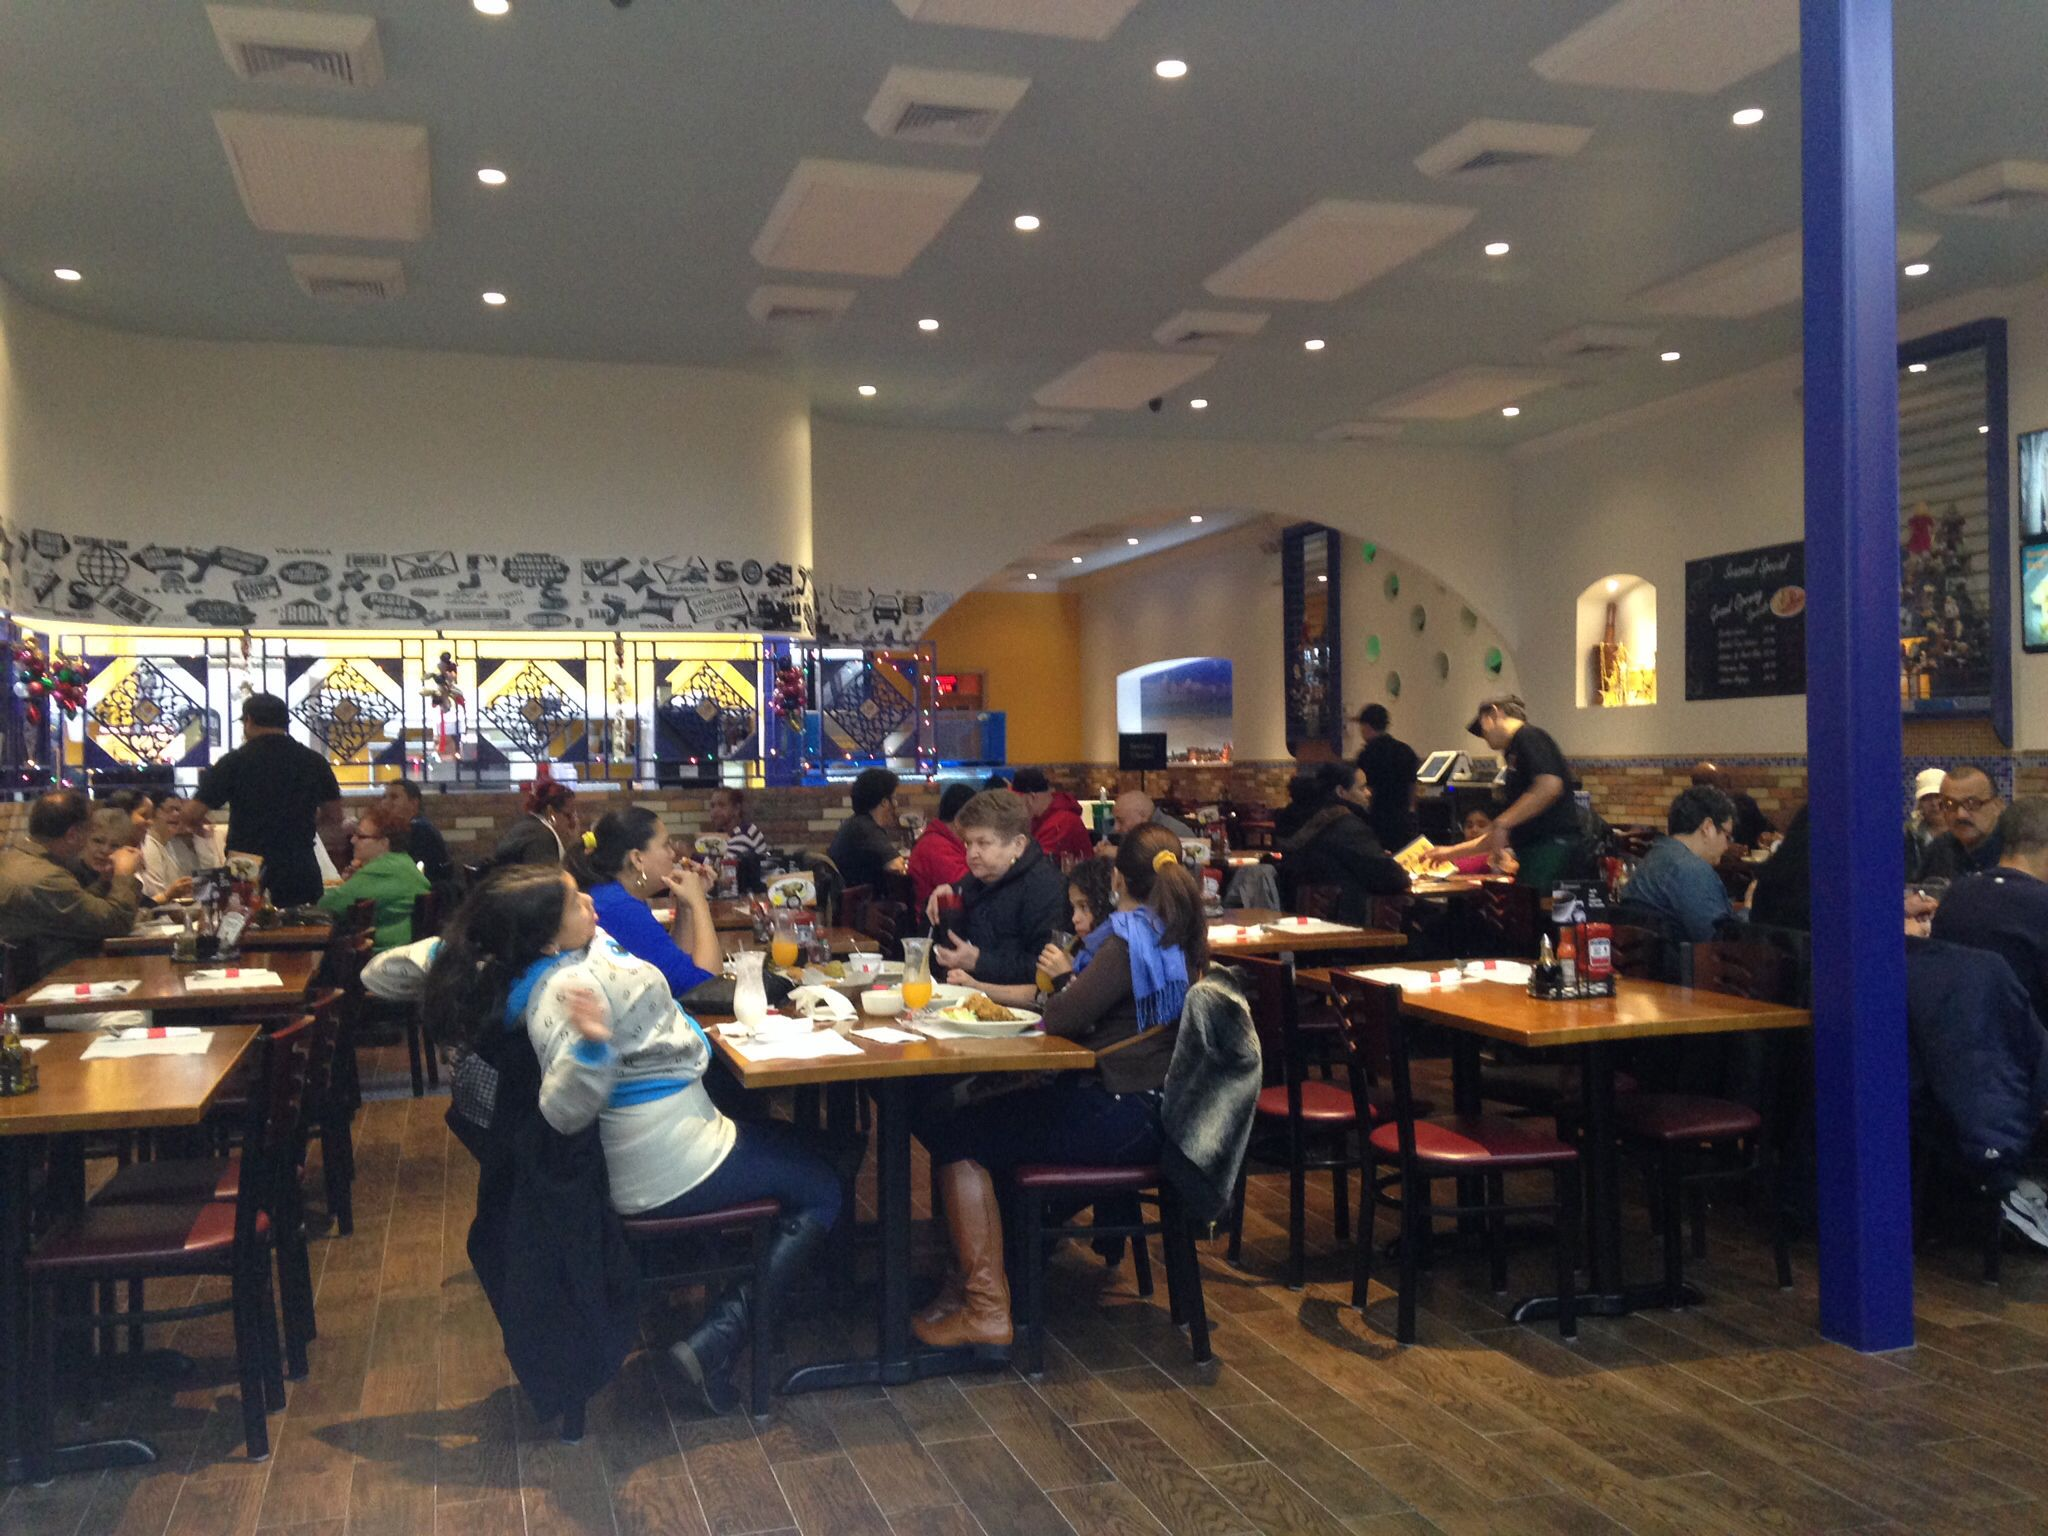 Sabrosura 2 Restaurant 1808 Westchester Ave Bronx Ny 10472 Sabrosura2 Com Restaurant Home Decor American Born Chinese